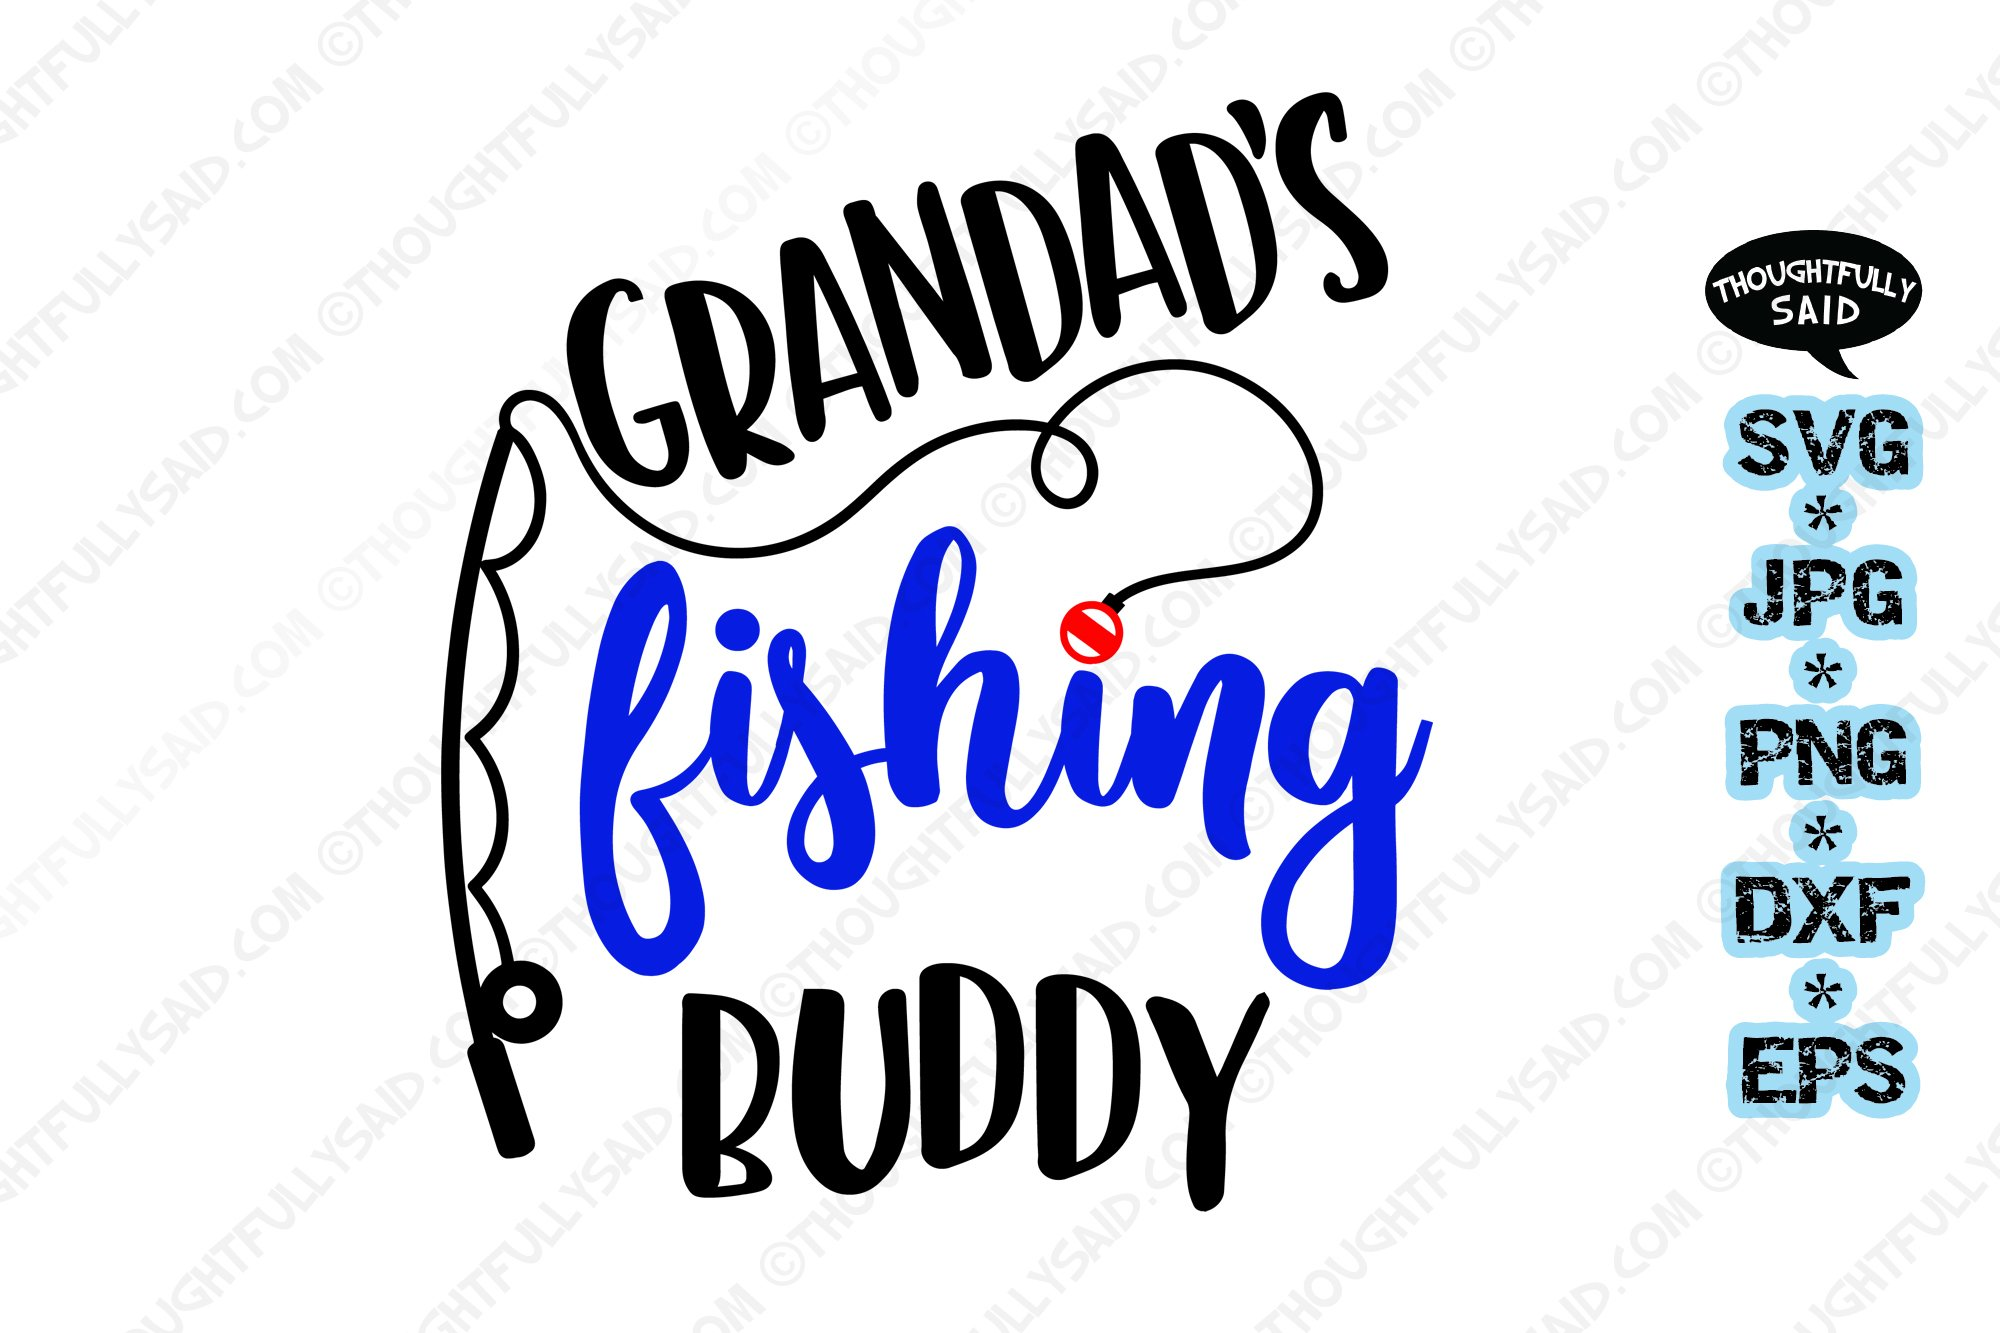 Download Grandads Fishing Buddy Svg Cutting File Jpg Png Dxf Eps 913516 Cut Files Design Bundles